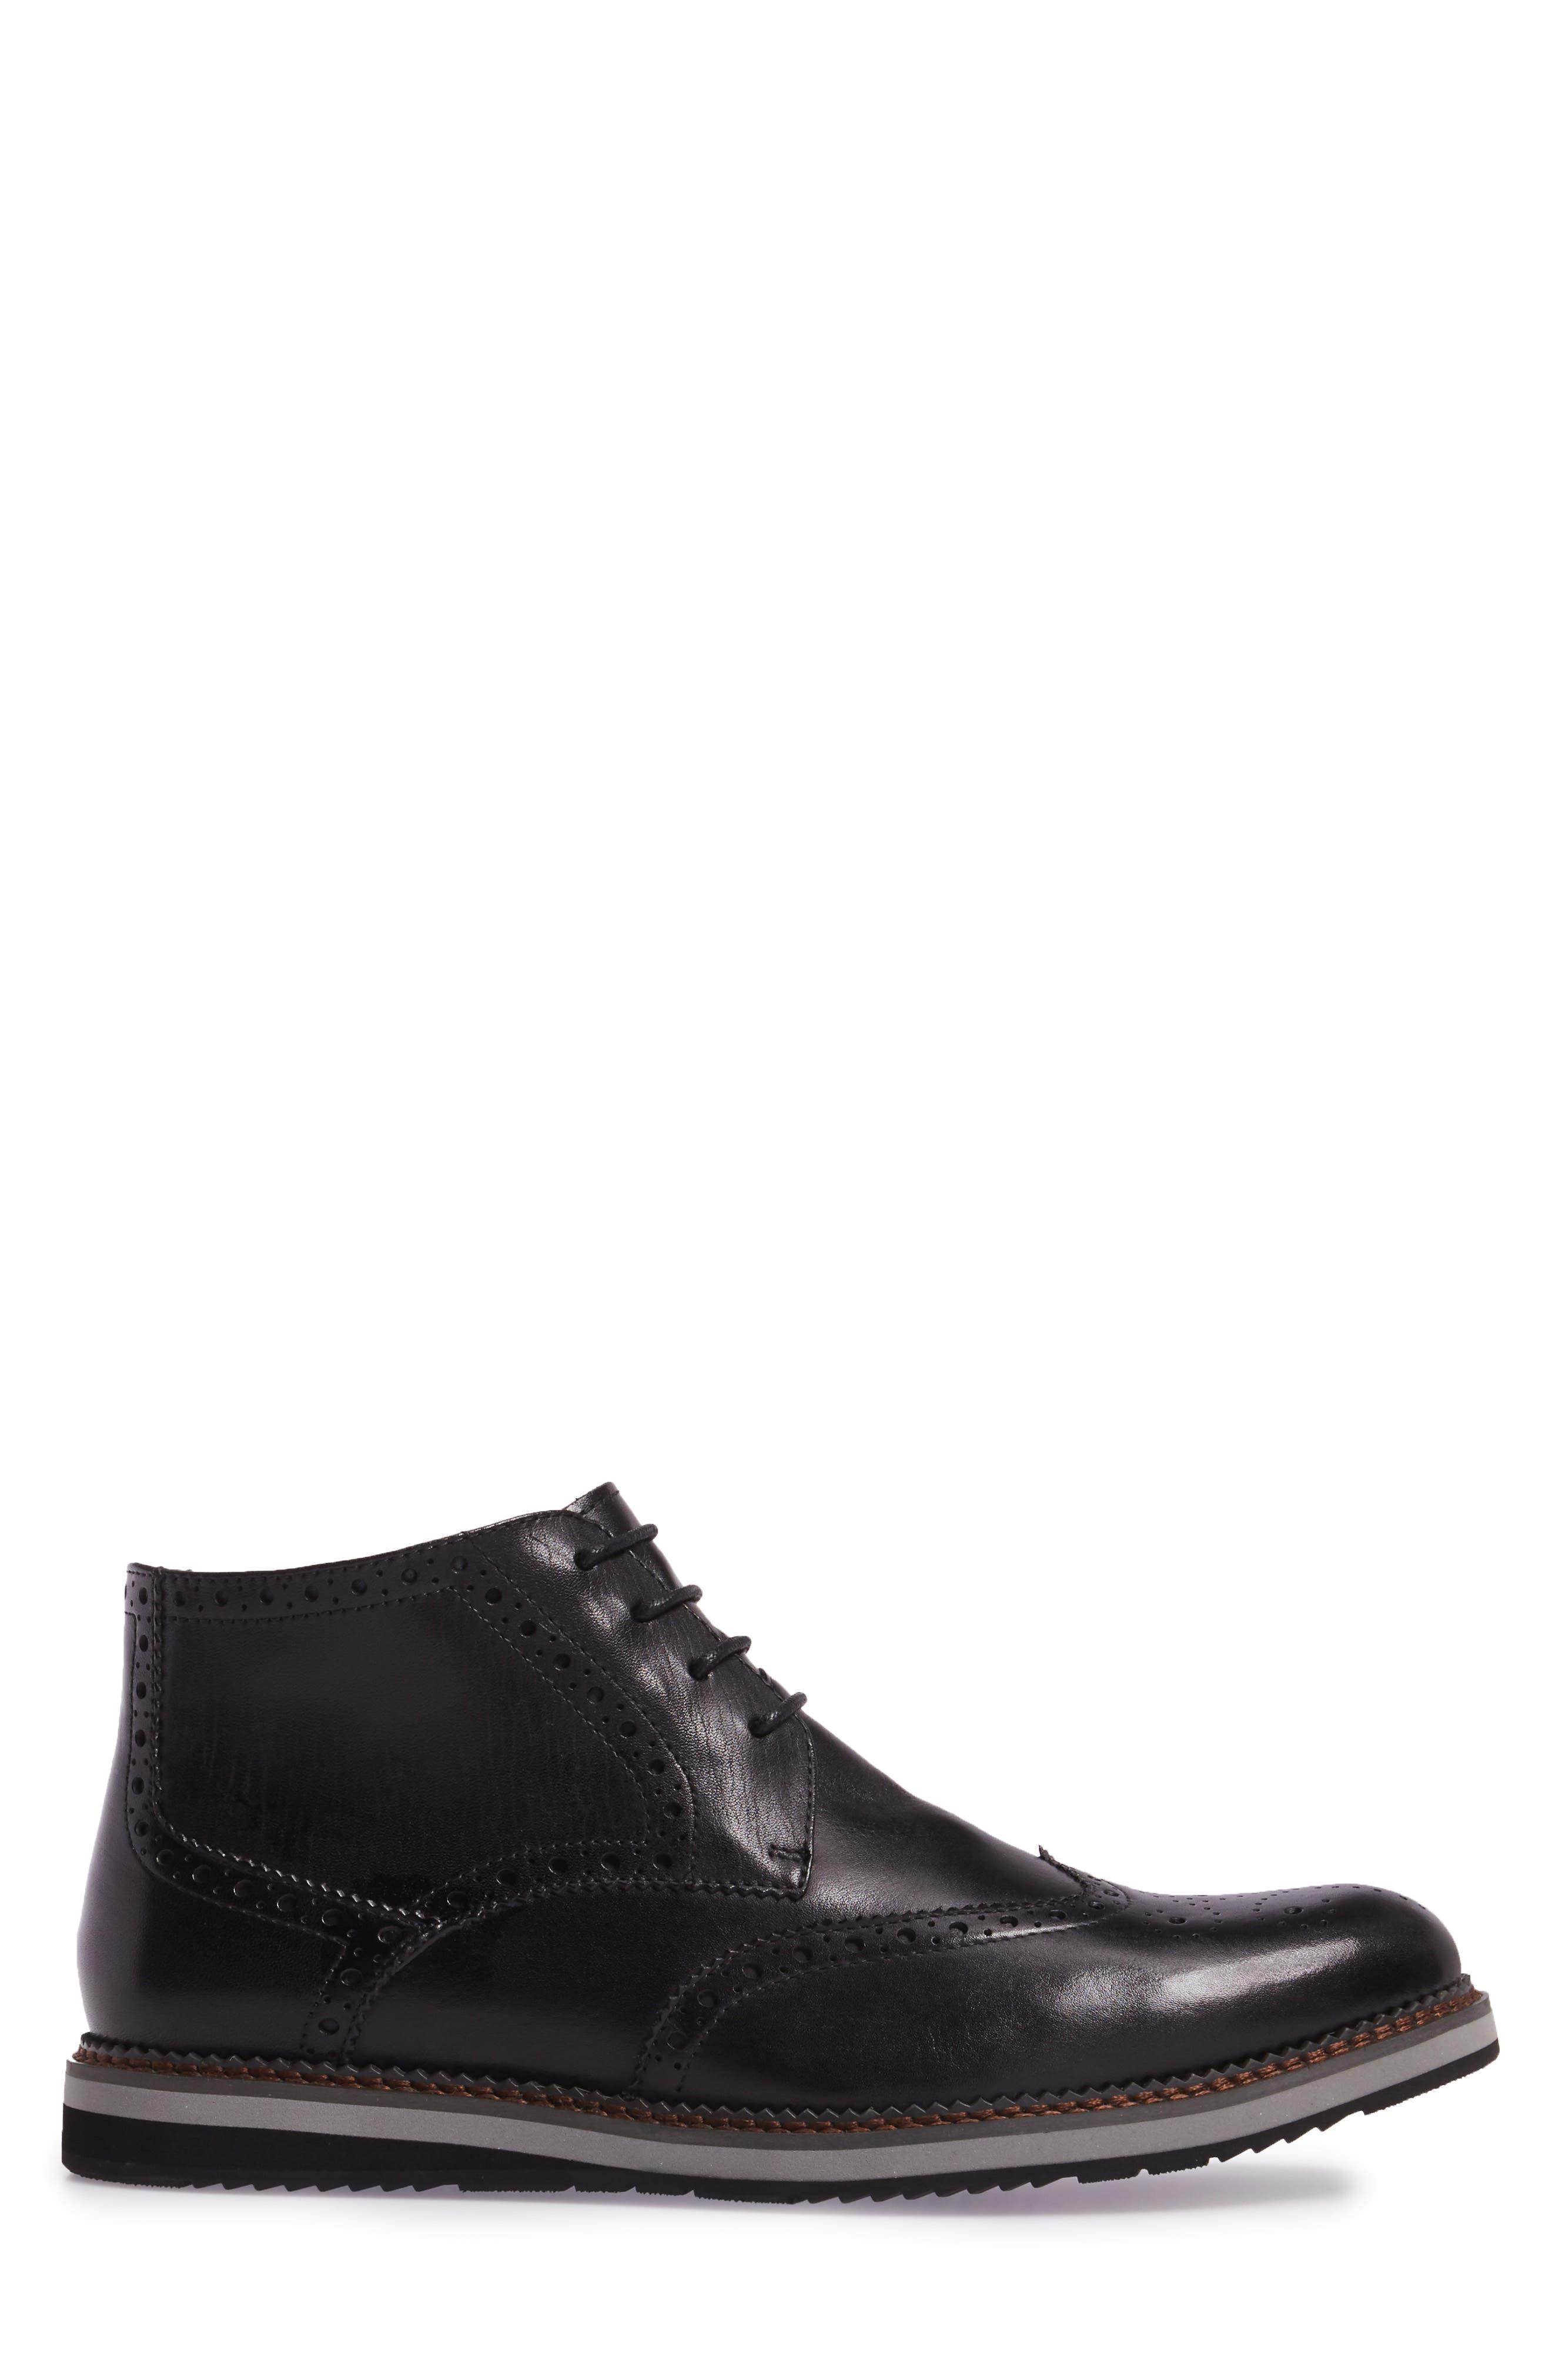 Ascot Wingtip Boot,                             Alternate thumbnail 3, color,                             Black Leather